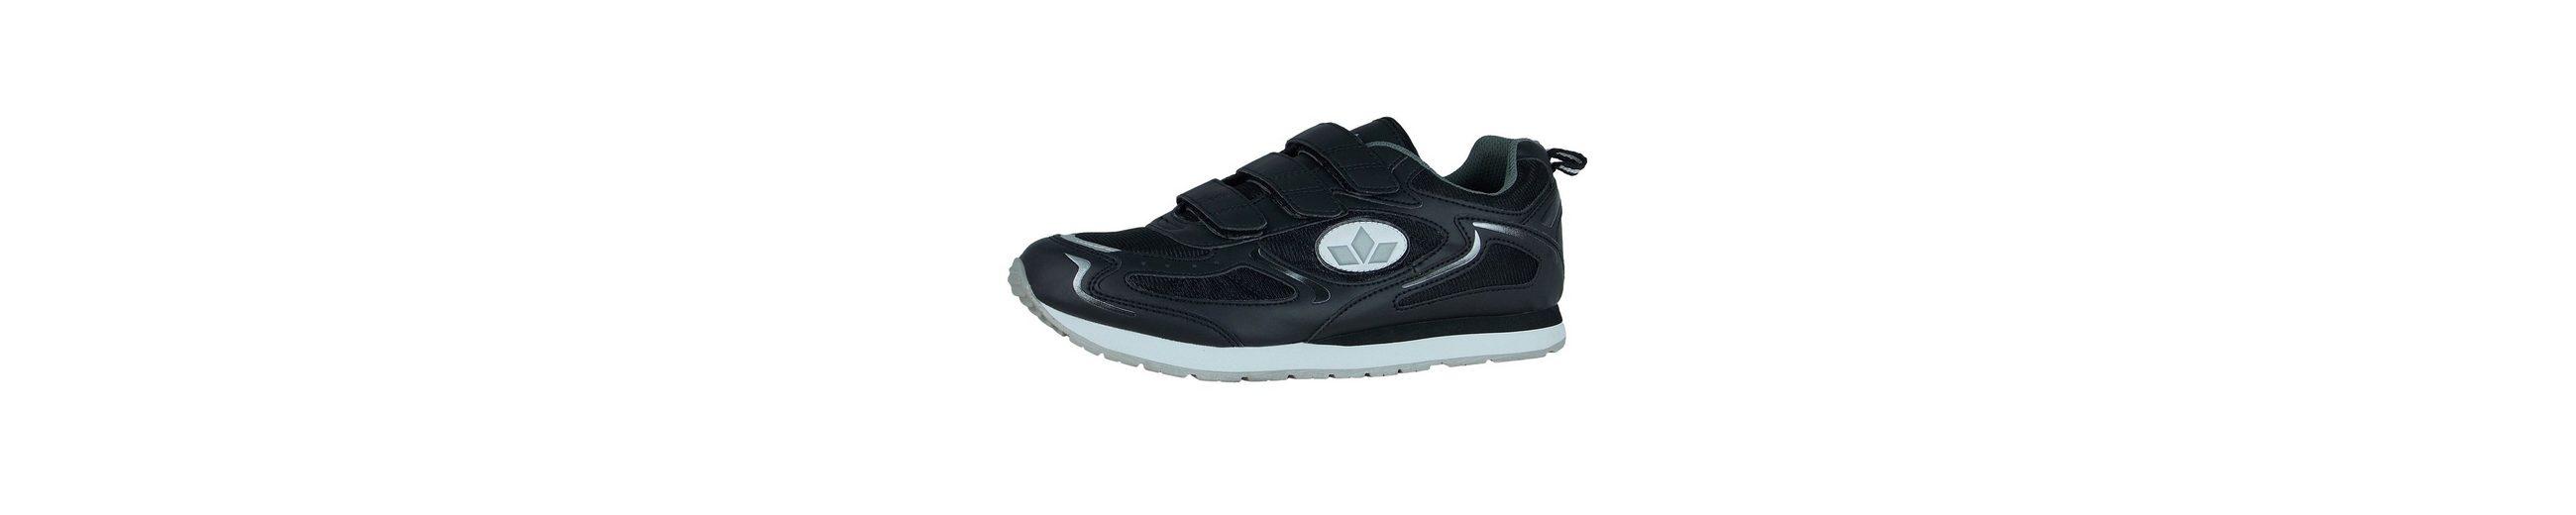 Footlocker Abbildungen Günstig Online Lico Joggingschuhe Nelson V Klettschuh Großer Verkauf lc23U7R